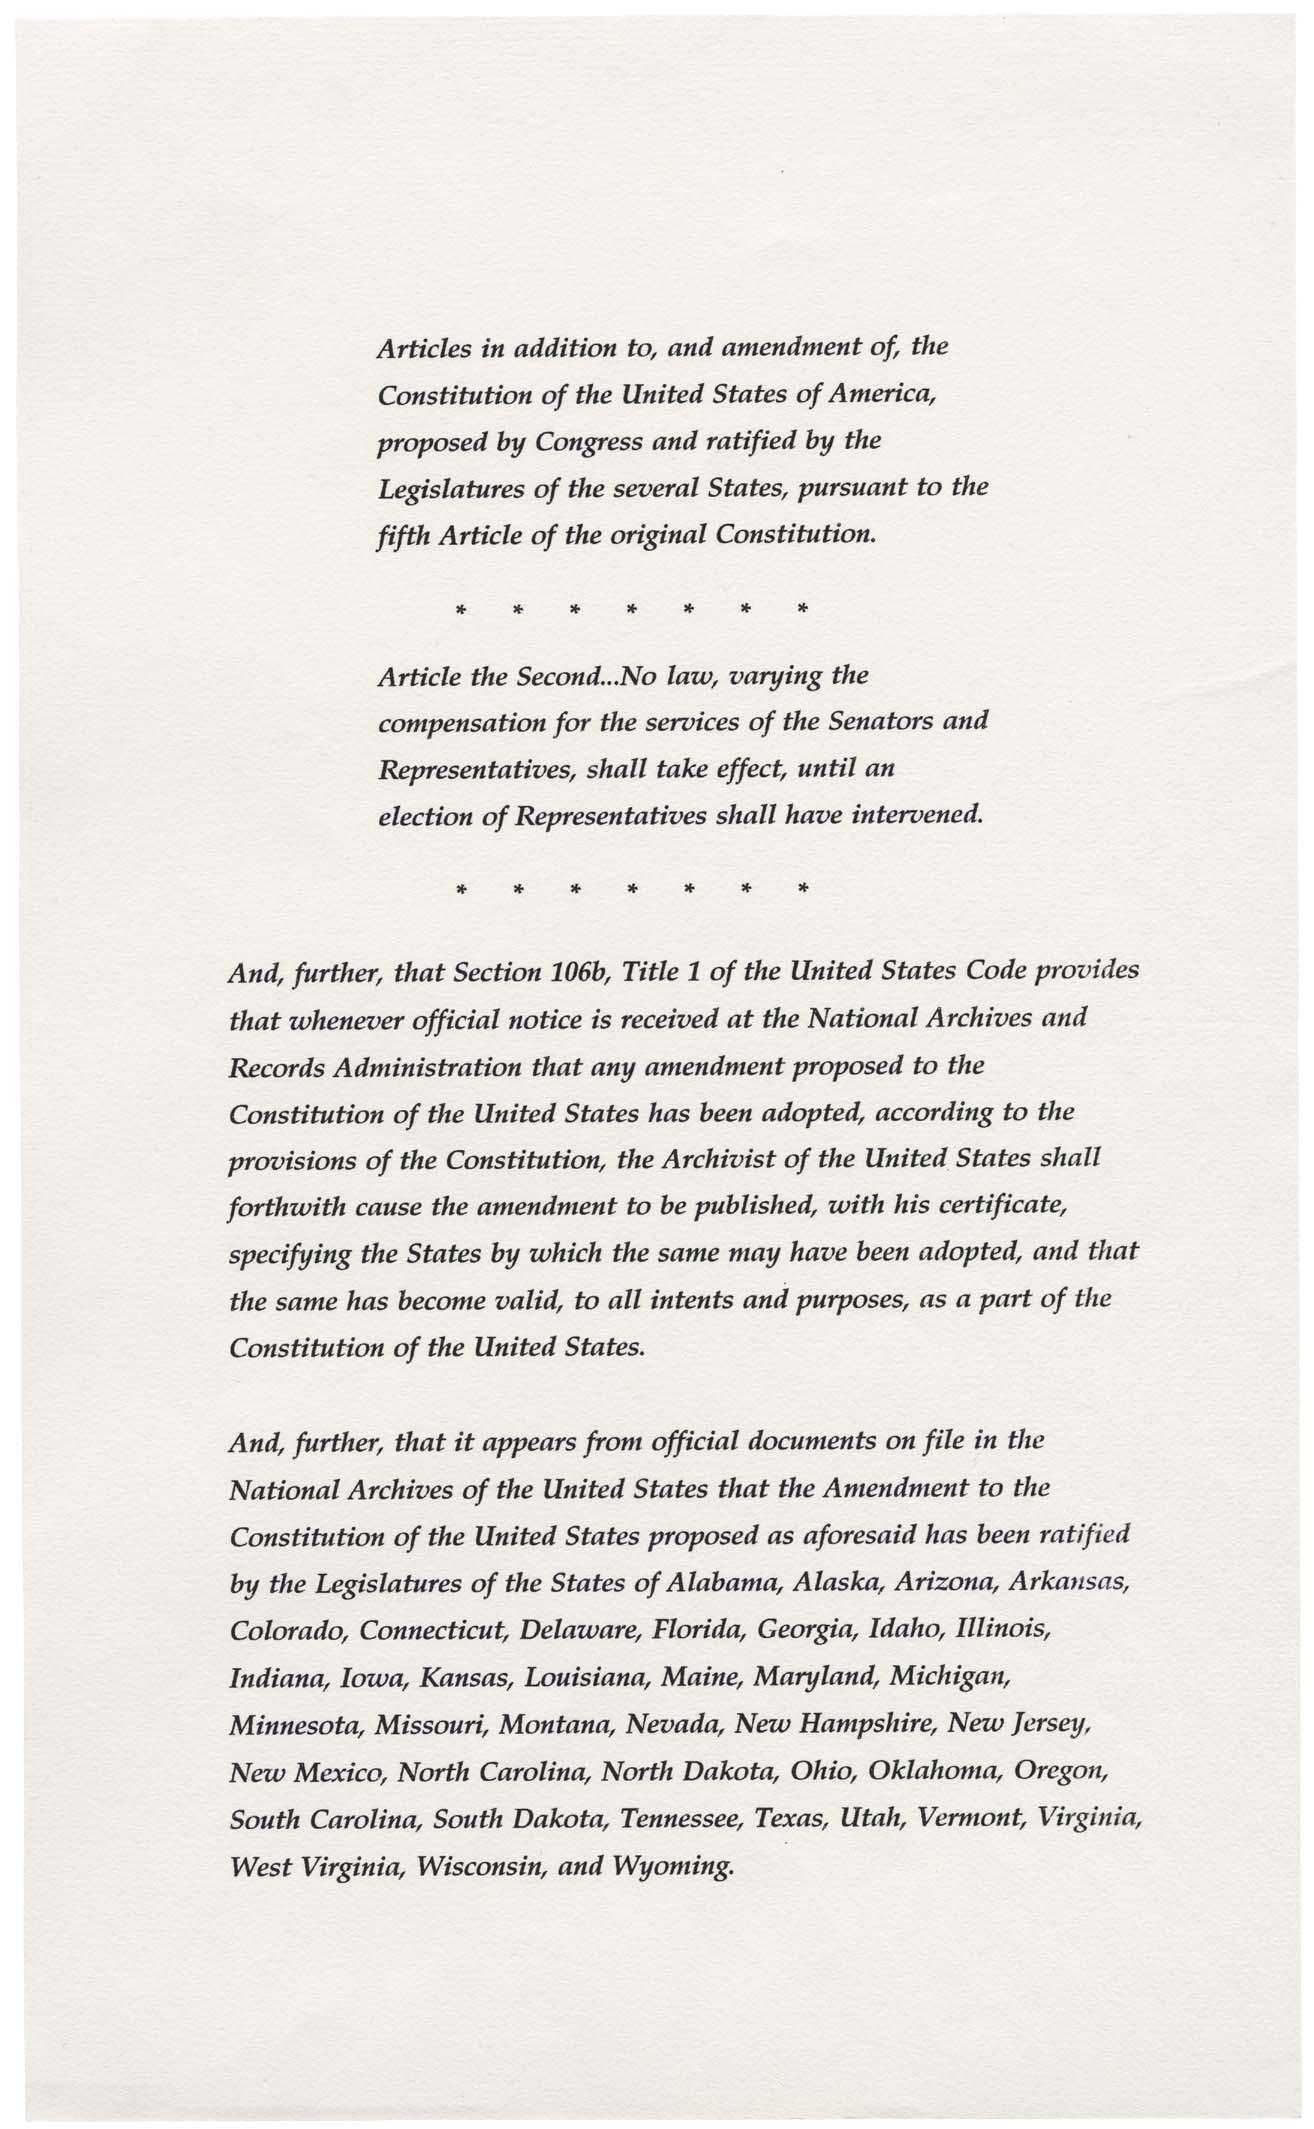 constitutional amendments 11-27